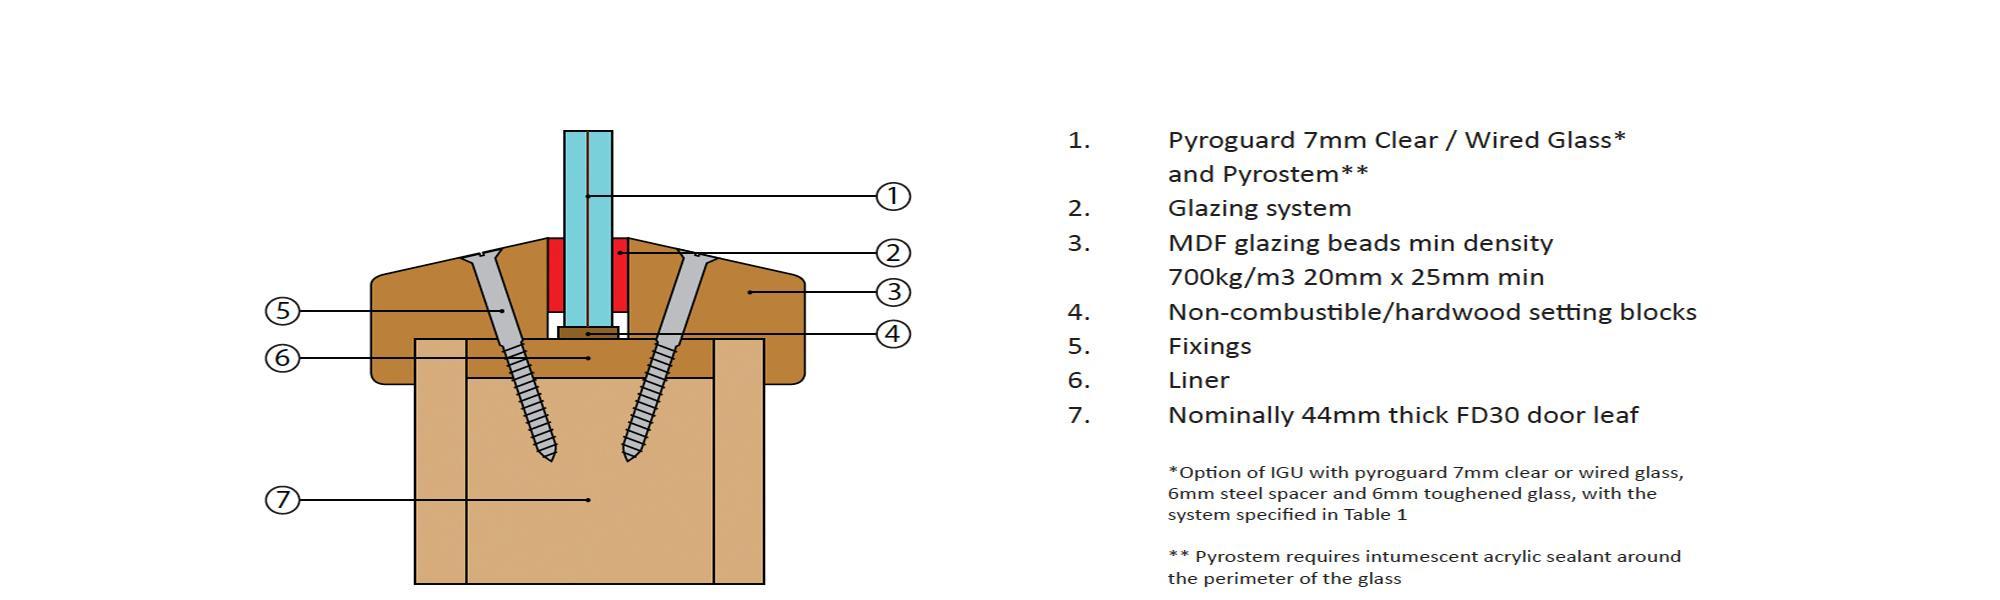 Morland QuickFix™ FD30 MDF Glazing Bead